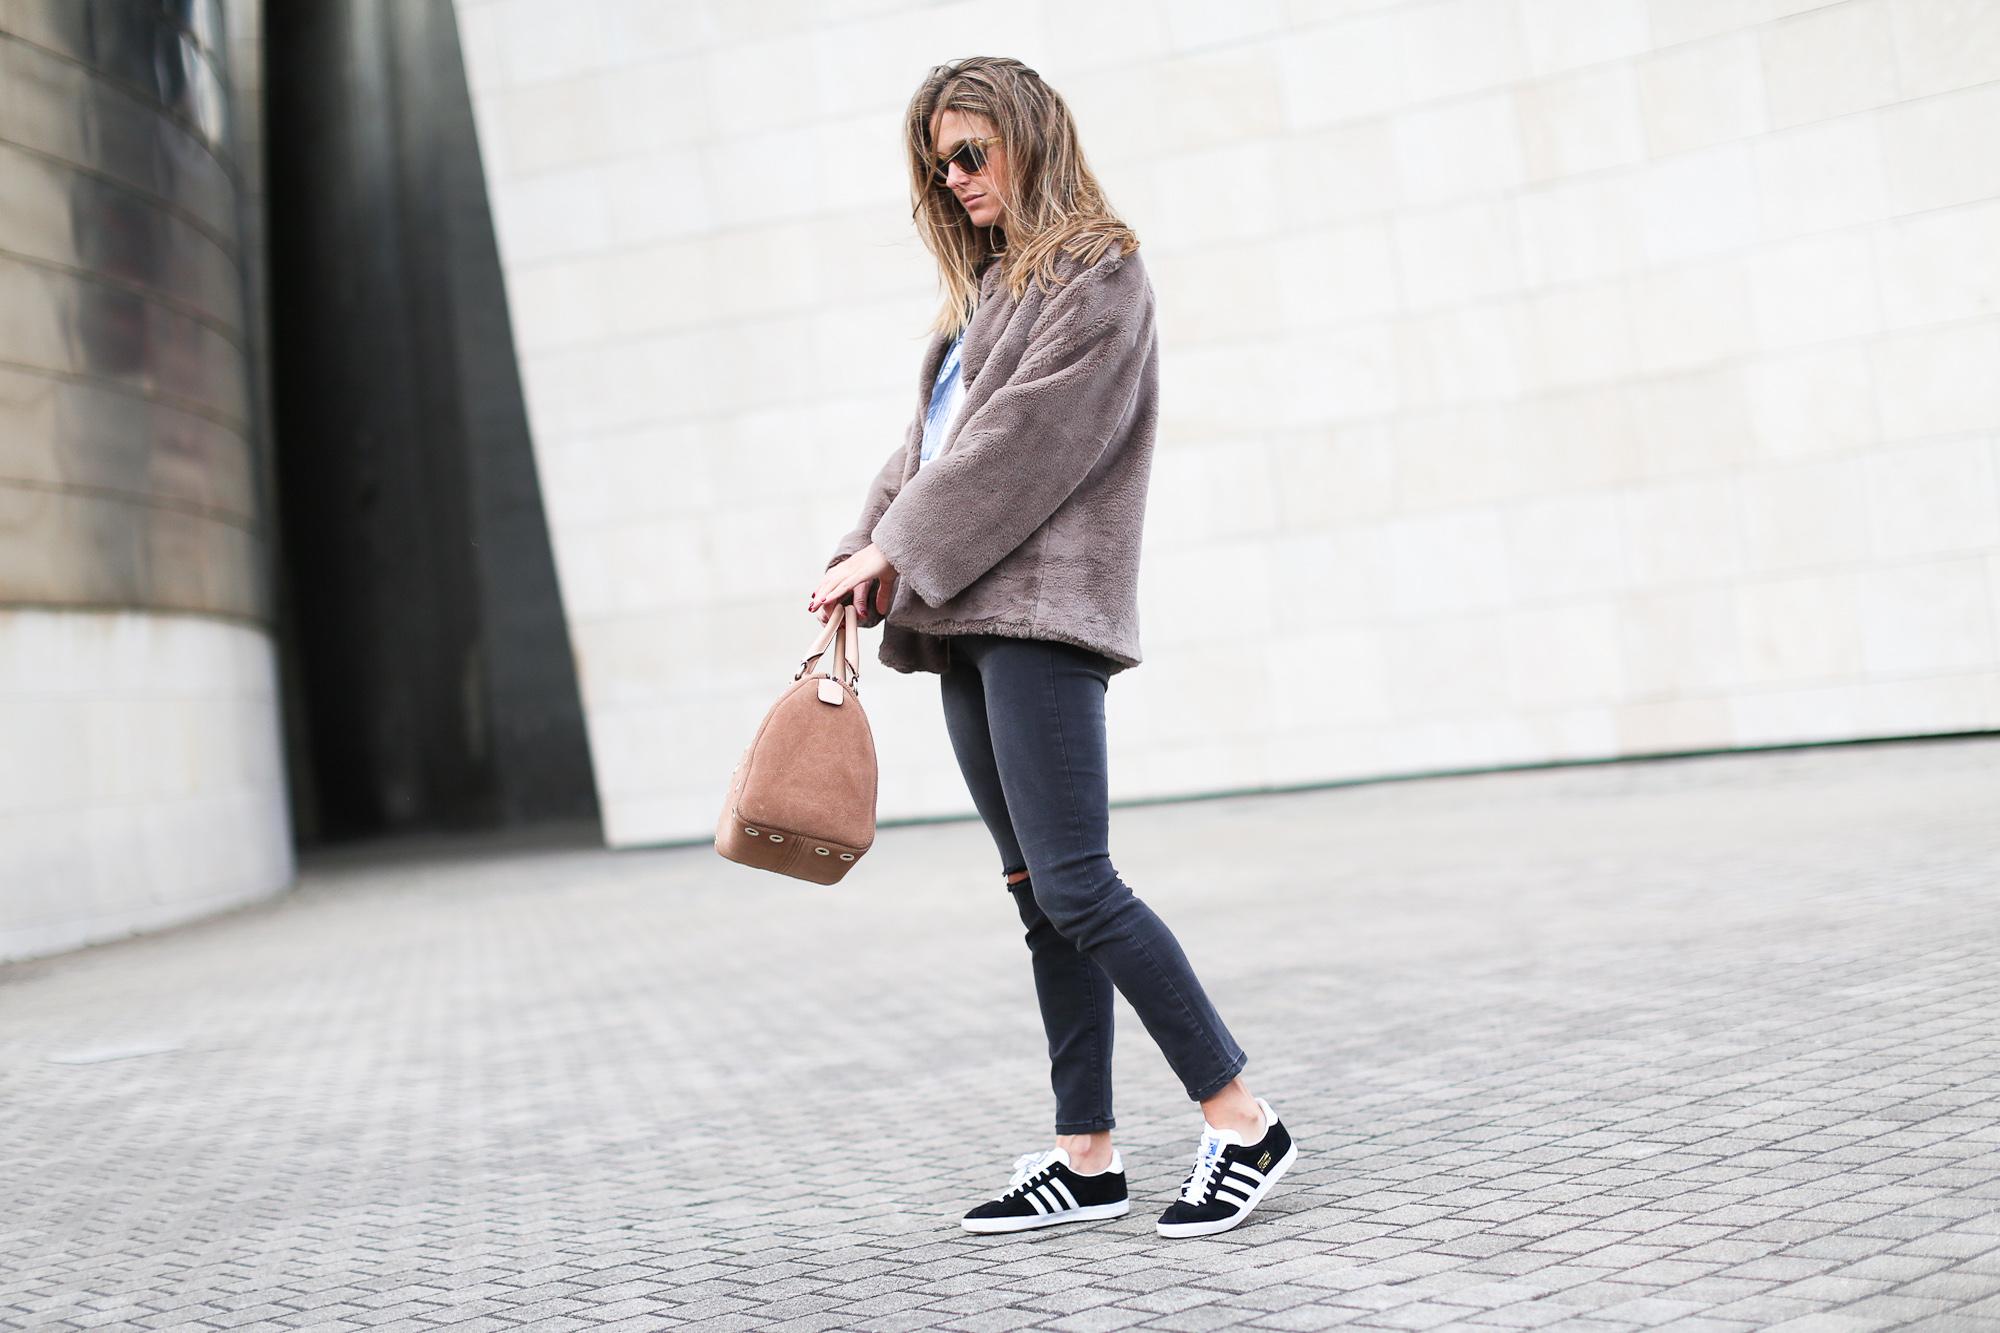 Clochet_streetstyle_fashionblogger_bilbao_guggenheim_purificaciongarcia_bolsoante_adidasgazelle-4